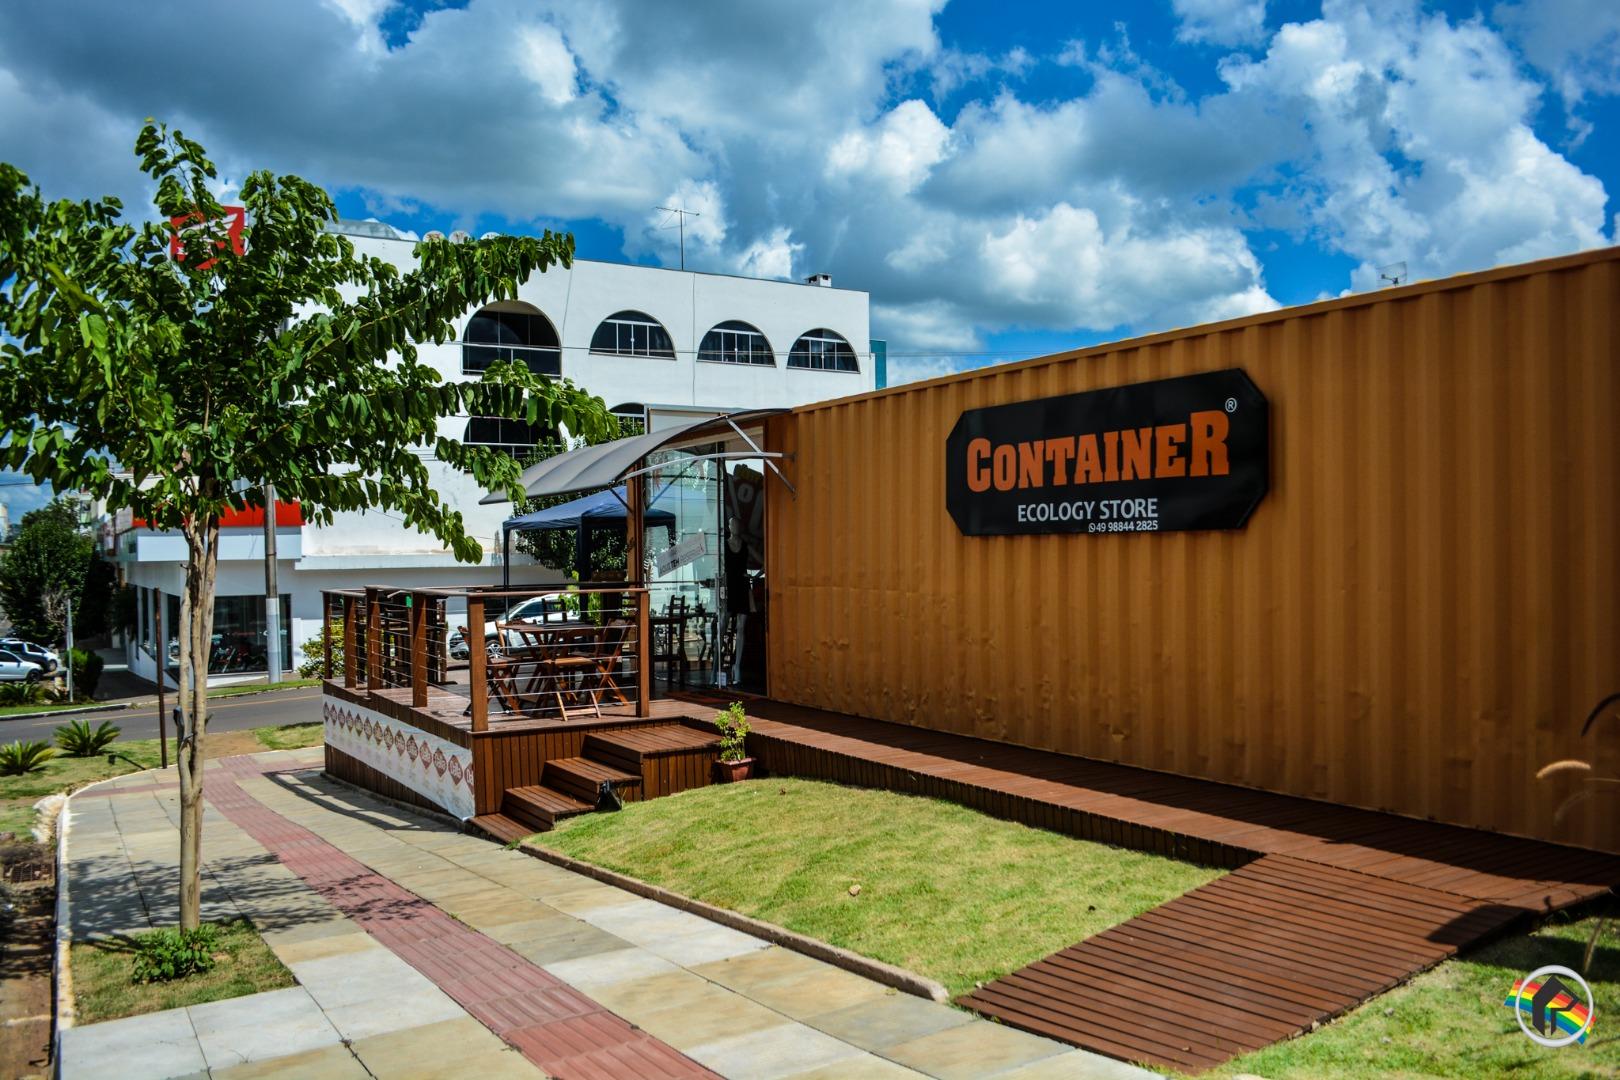 Container Ecology Store e Chop Dalla formam parceria